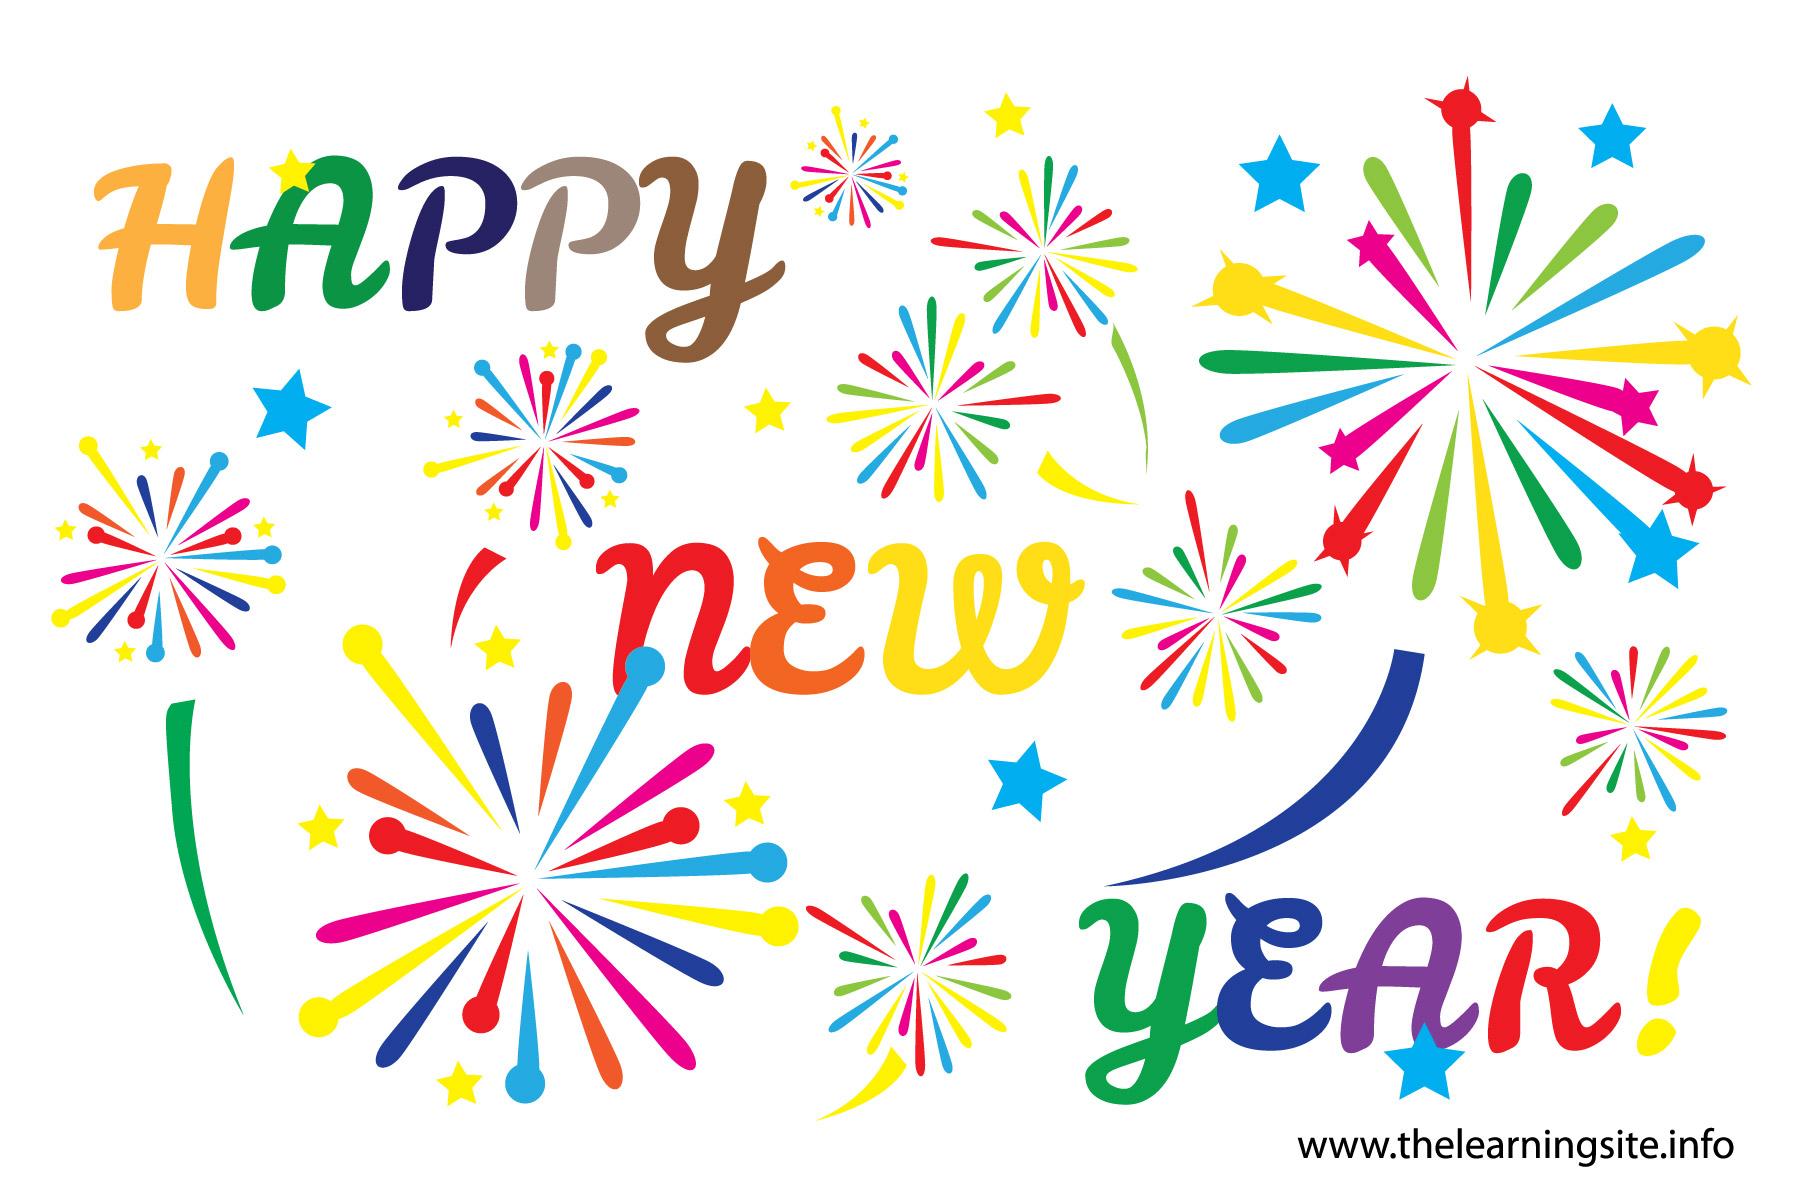 Happy New Year Clipart - .-Happy New Year Clipart - .-5